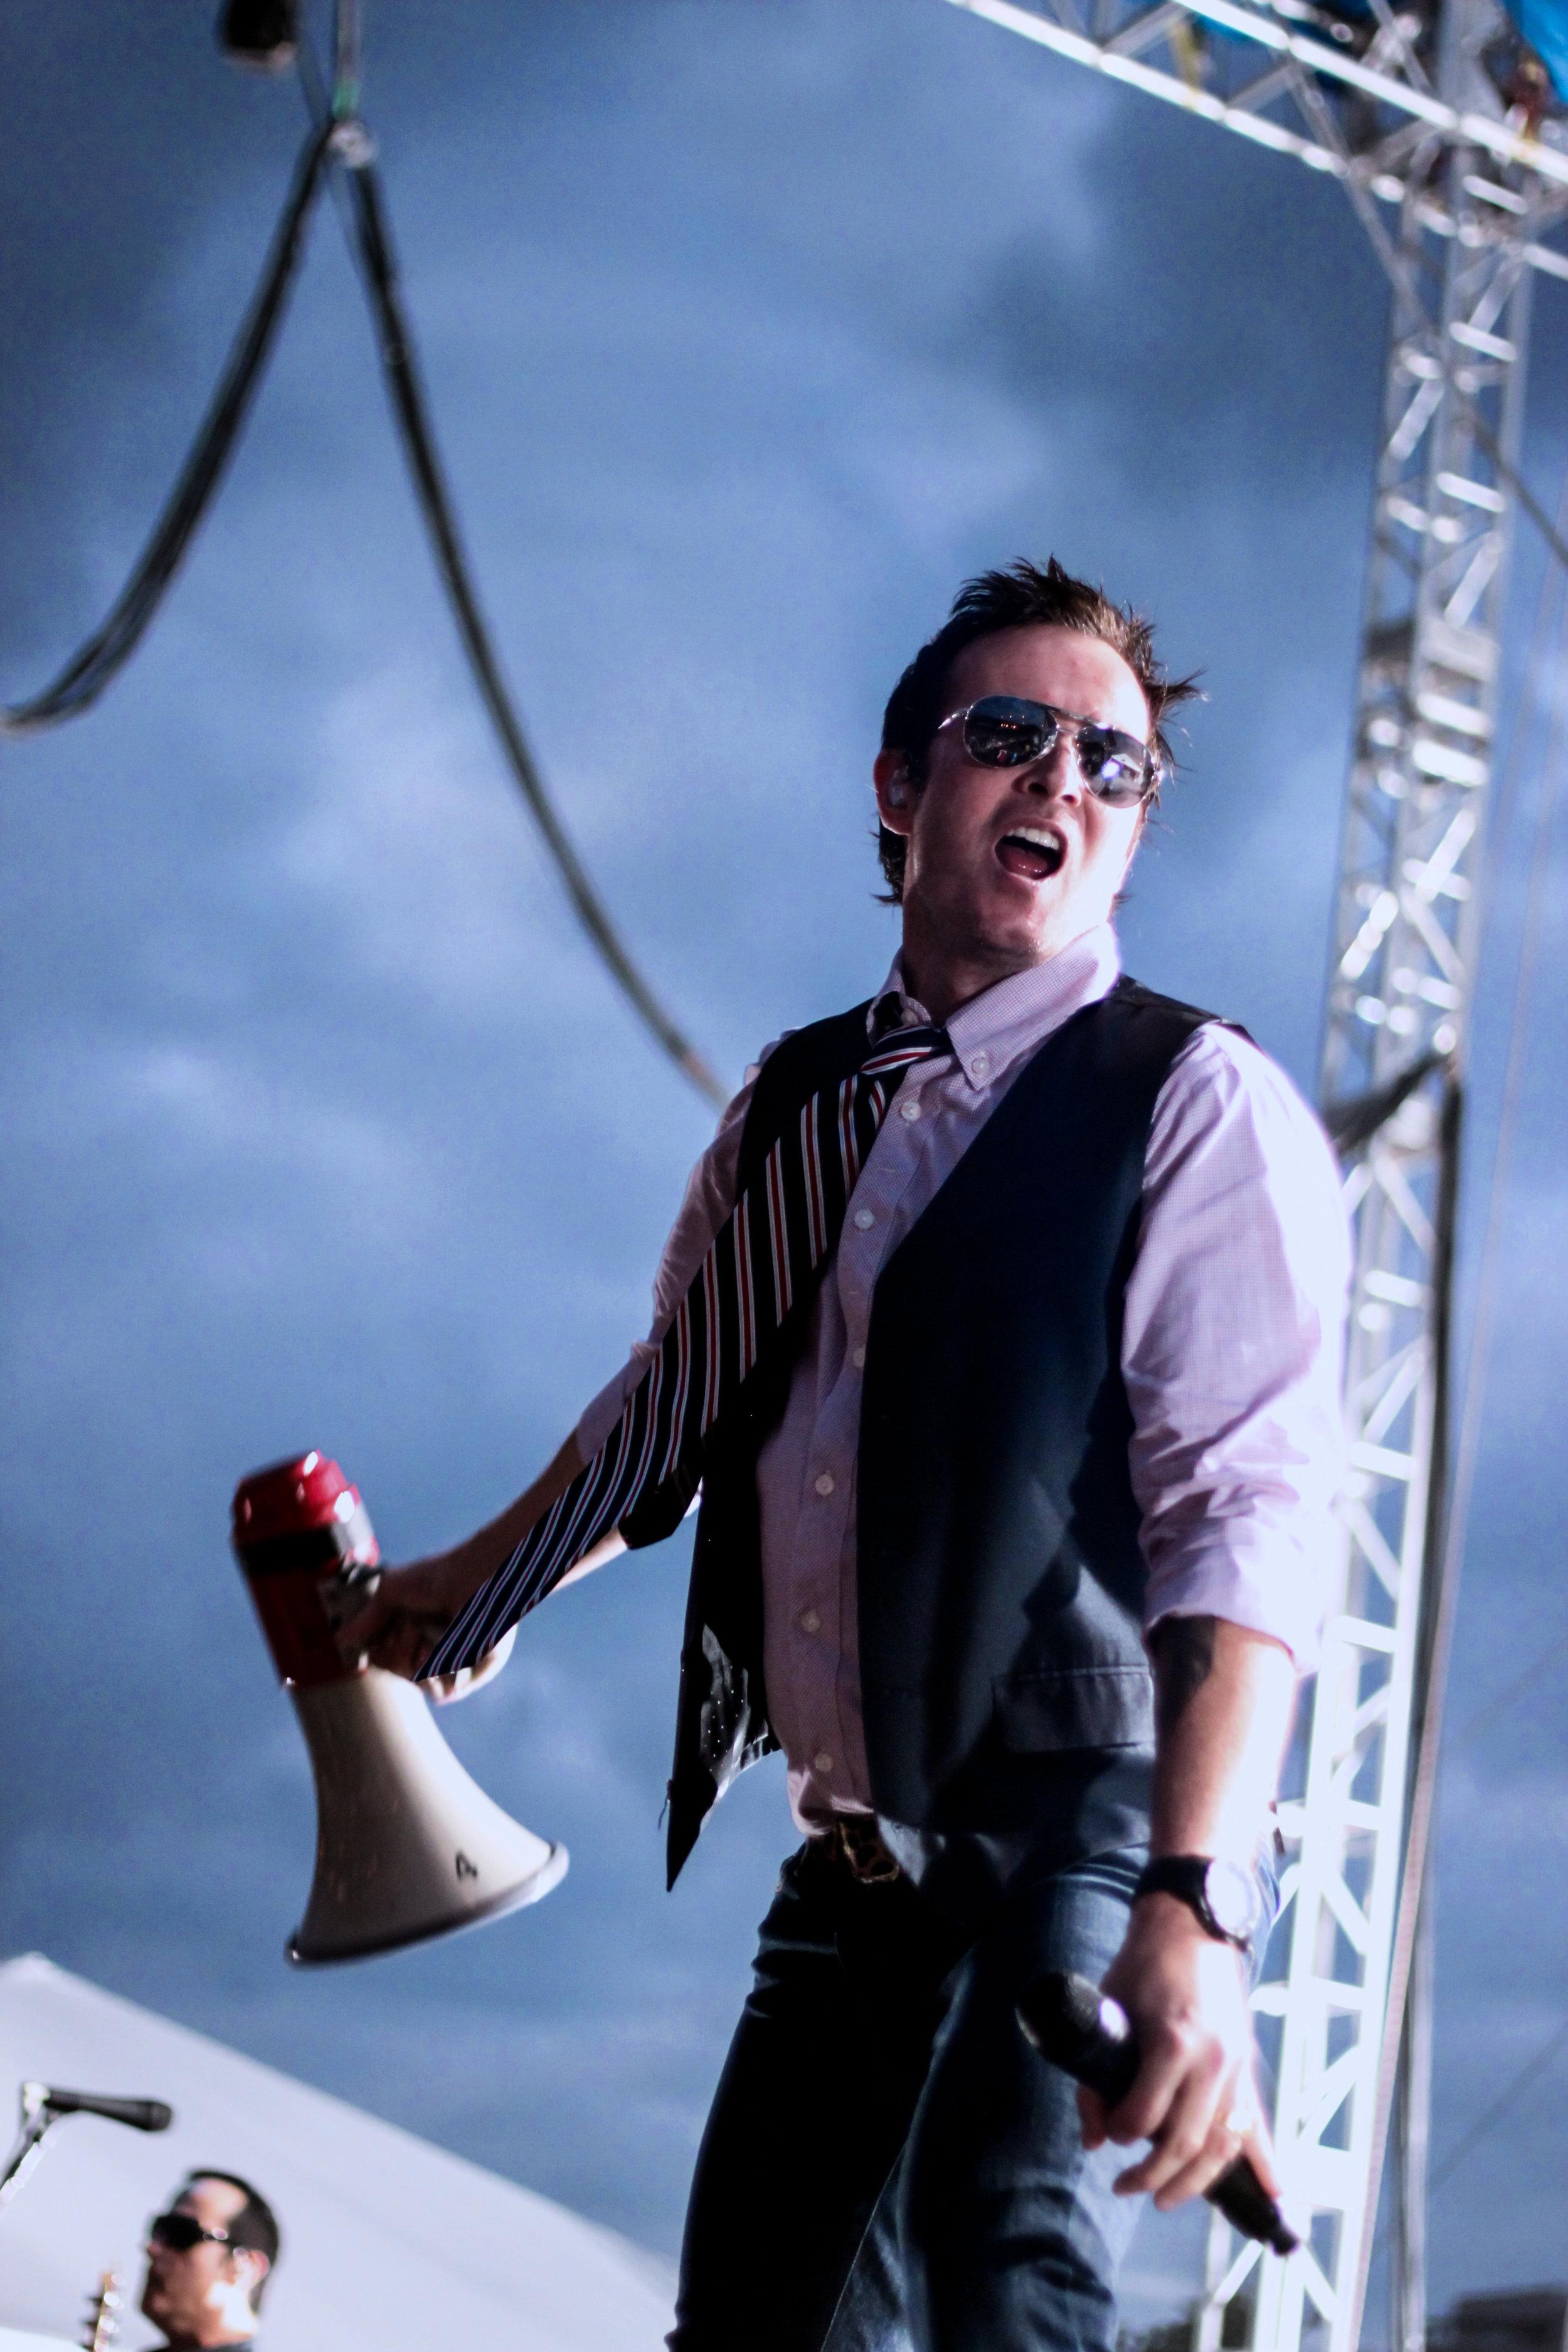 Scott Weiland/Stone Temple Pilots - 2011